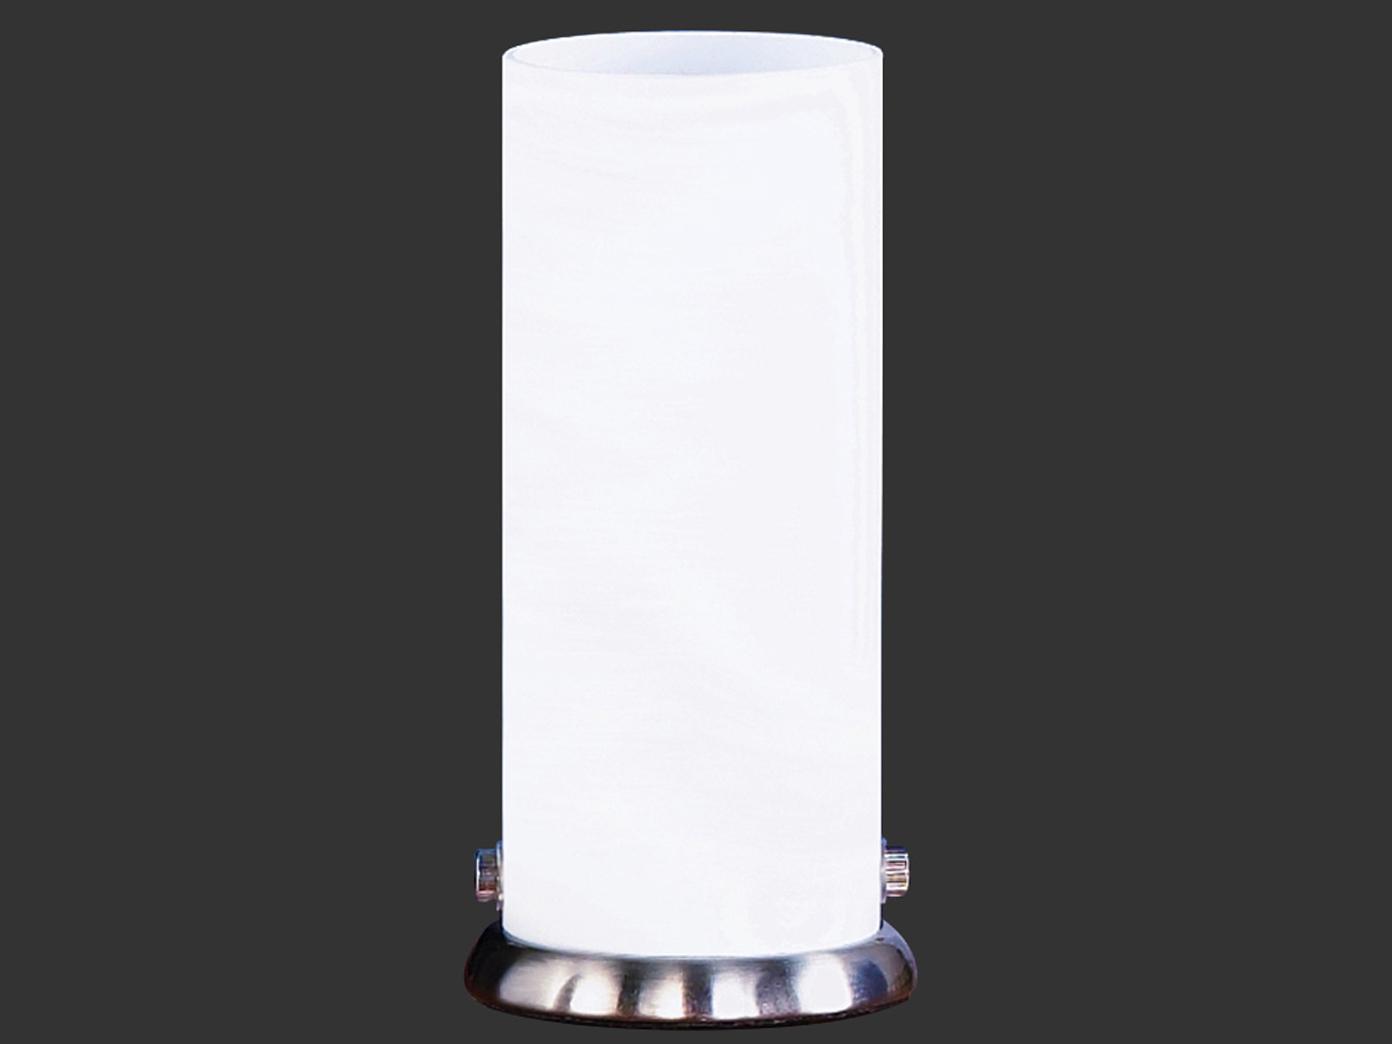 TRIO Tischlampe, E14, Ø 9cm, Höhe 20cm, Chrom, Glas weiß